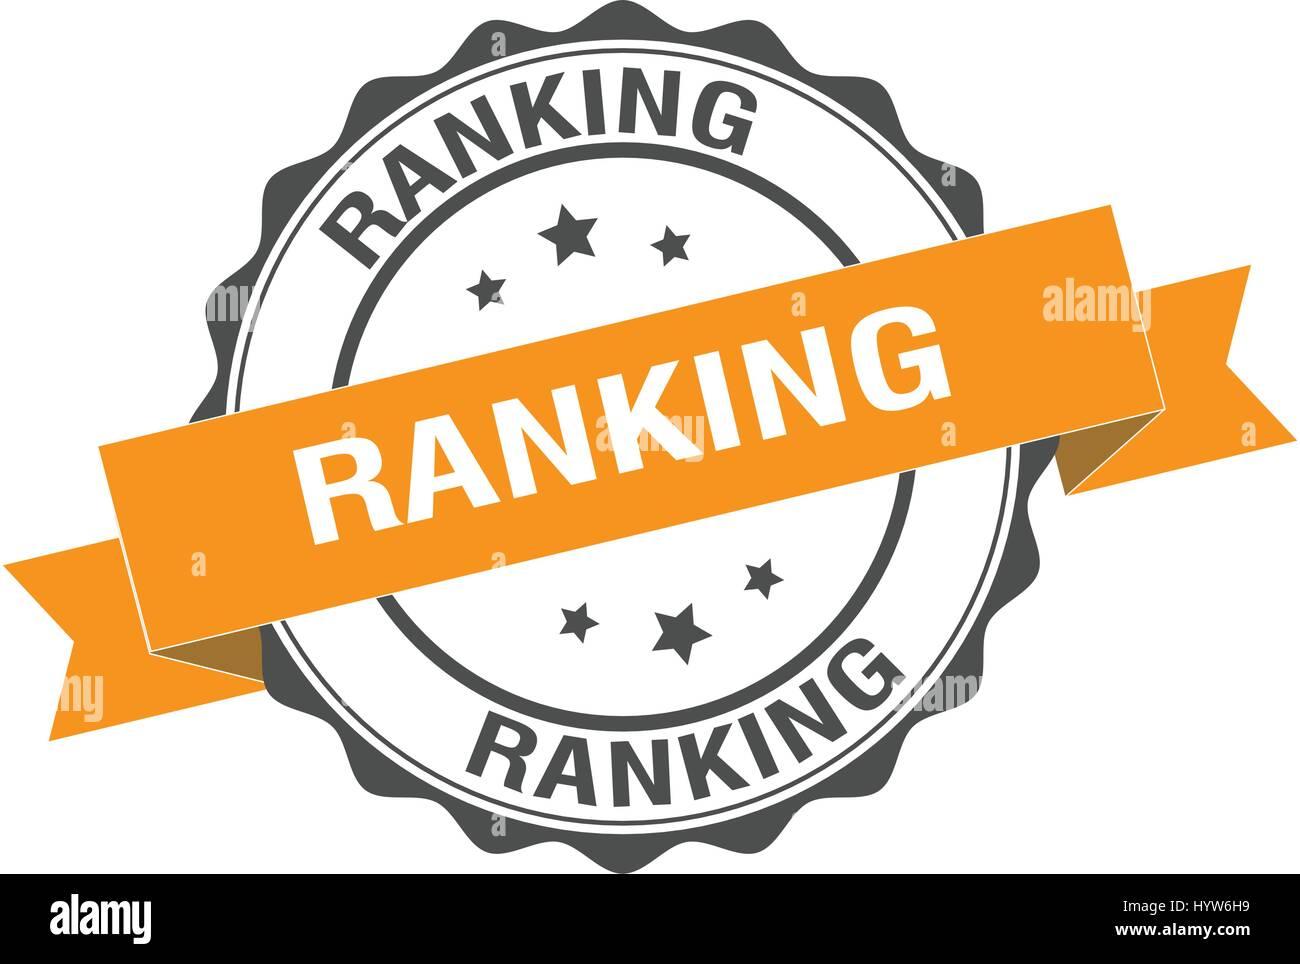 Ranking-Stempel-Abbildung Stockbild